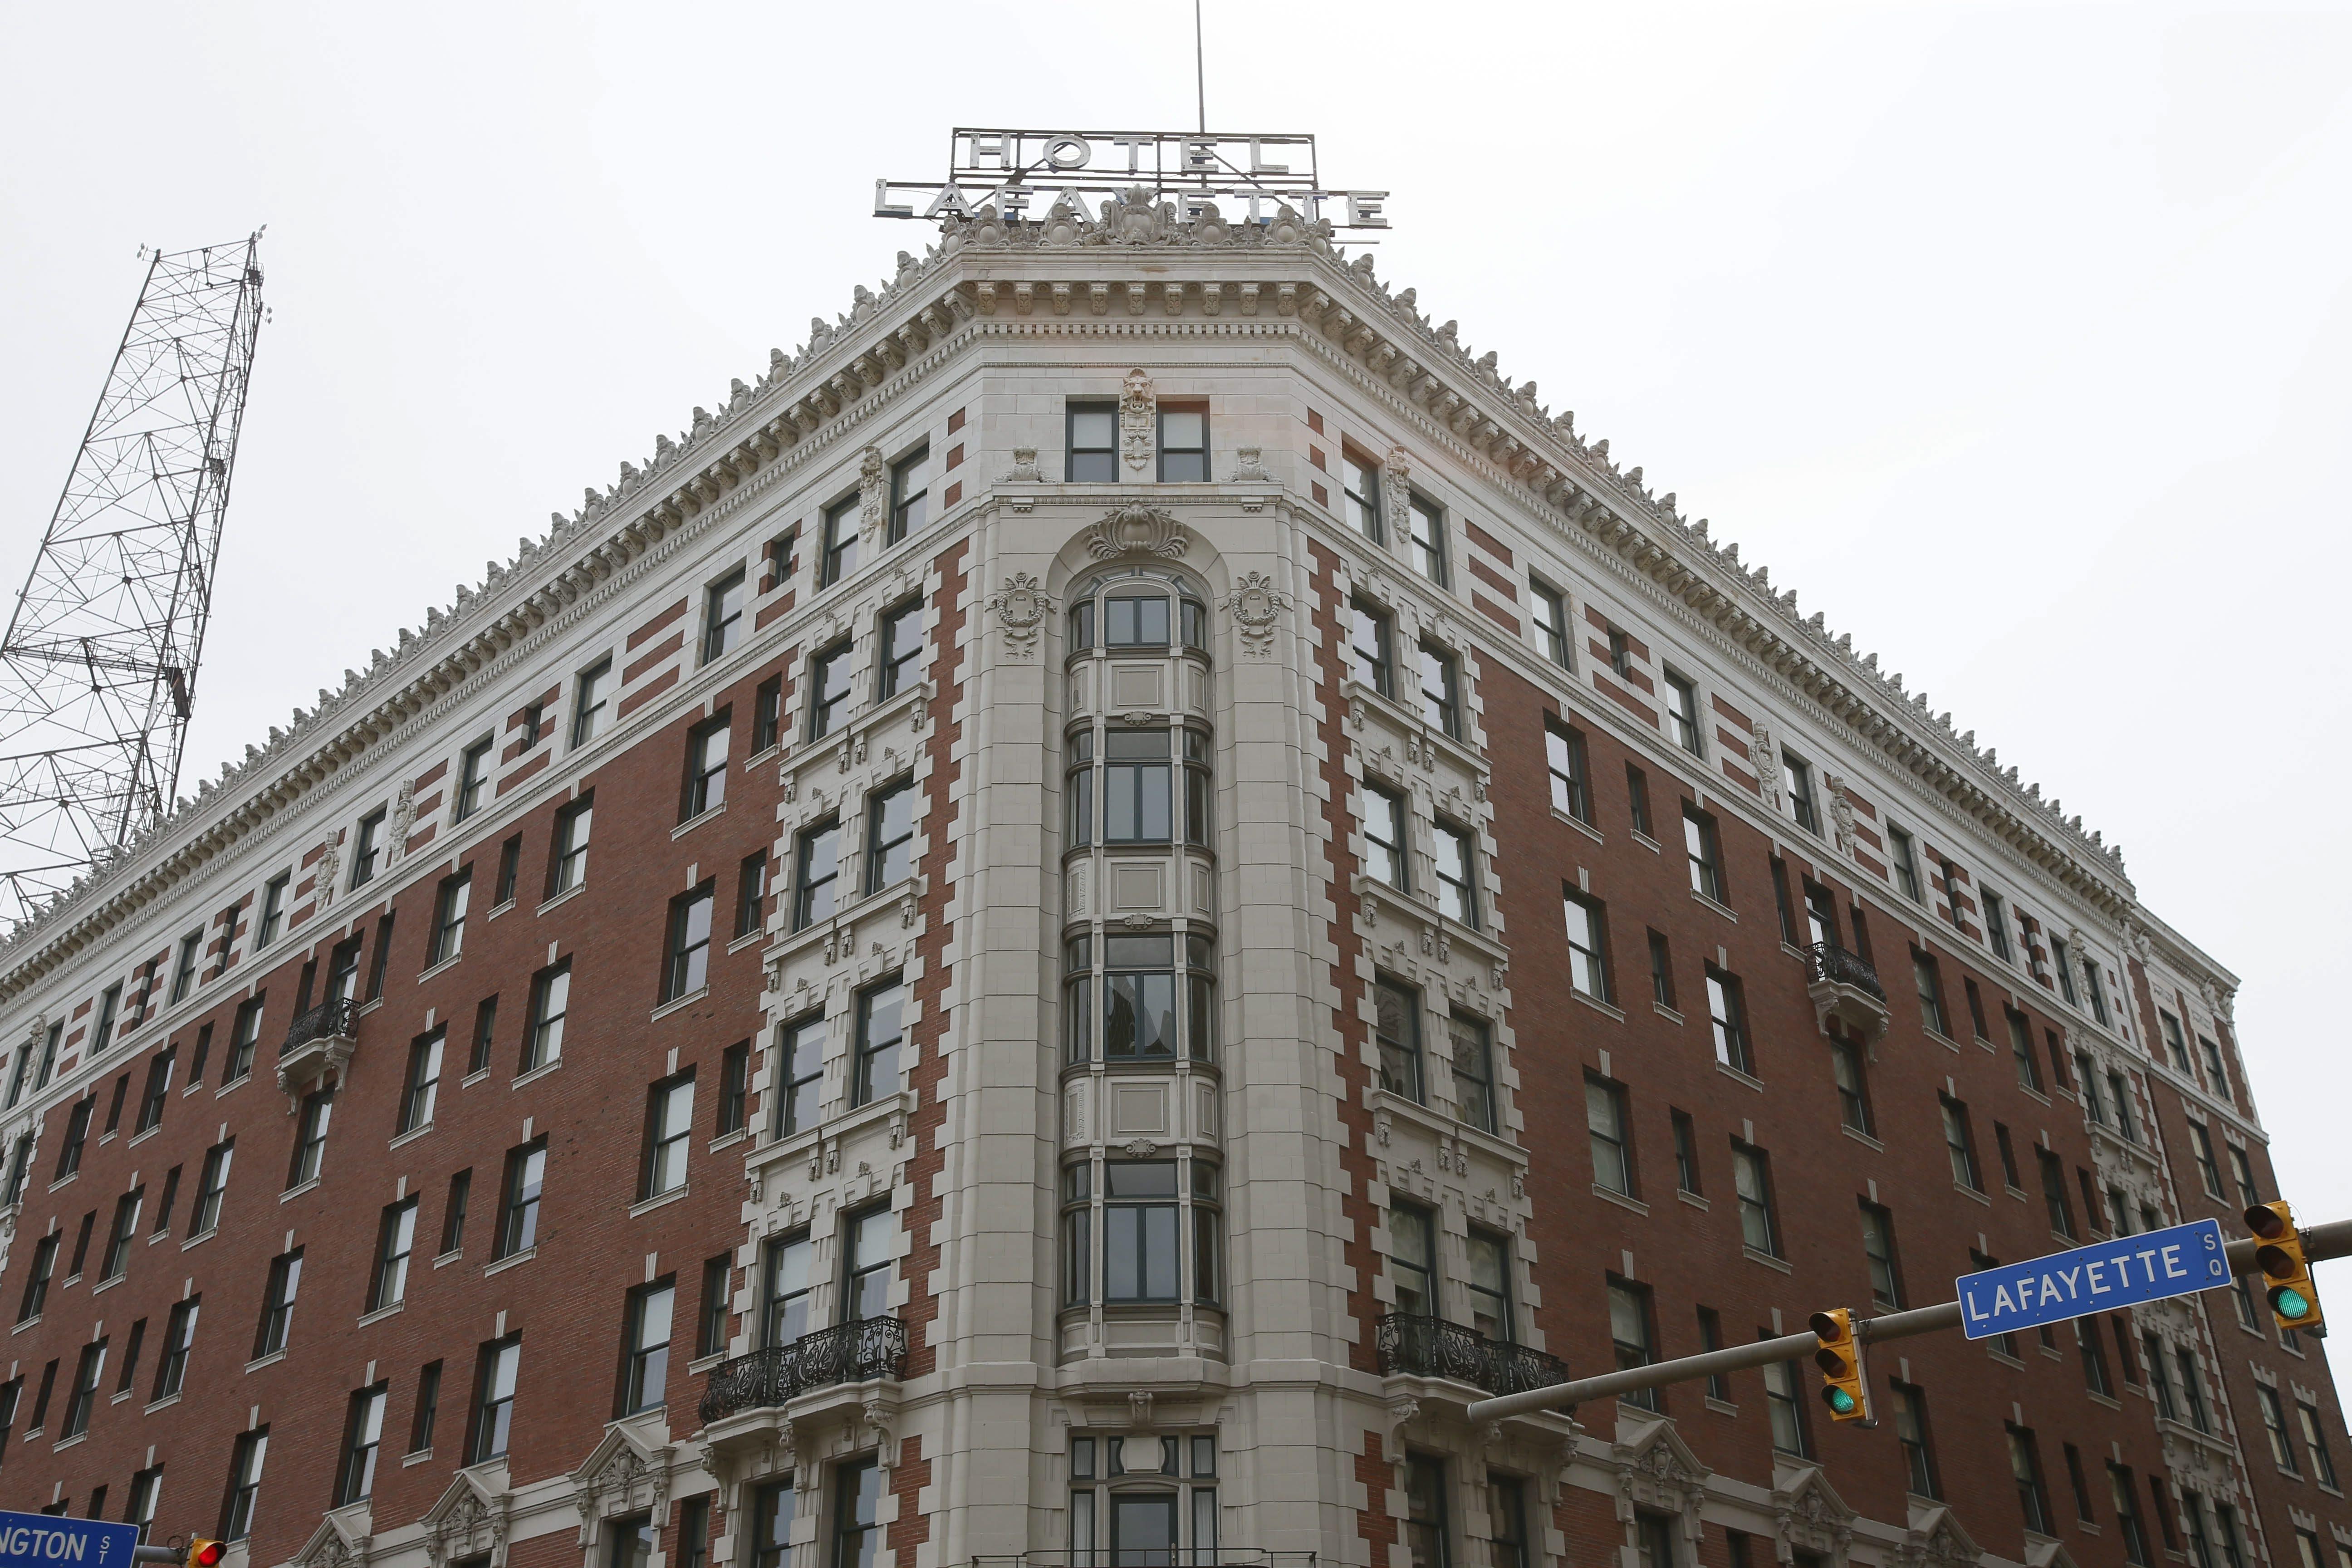 Explore Buffalo's walking tour visits architectural landmarks like the Hotel Lafayette.  (Derek Gee/Buffalo News file photo)